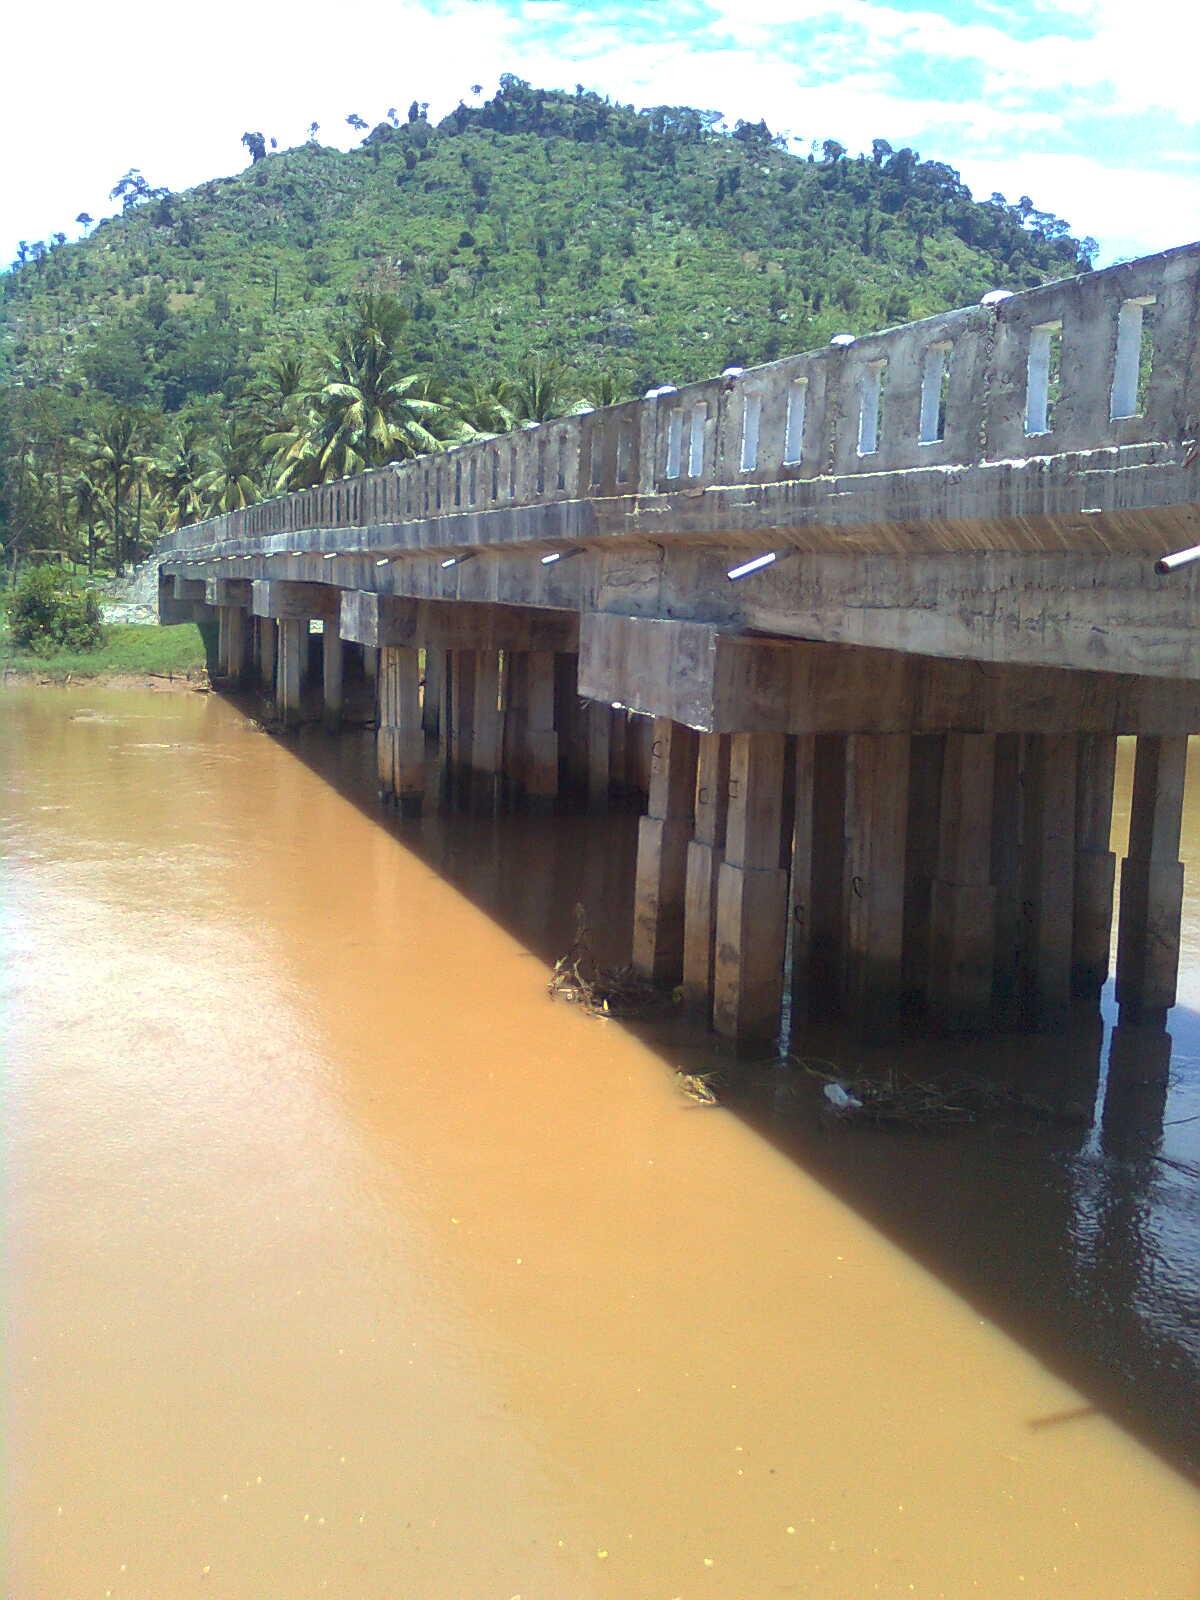 Koran Pilar Jembatan Pantai Konang Rawan Ambrol Binamarga Upaya Pemerintah